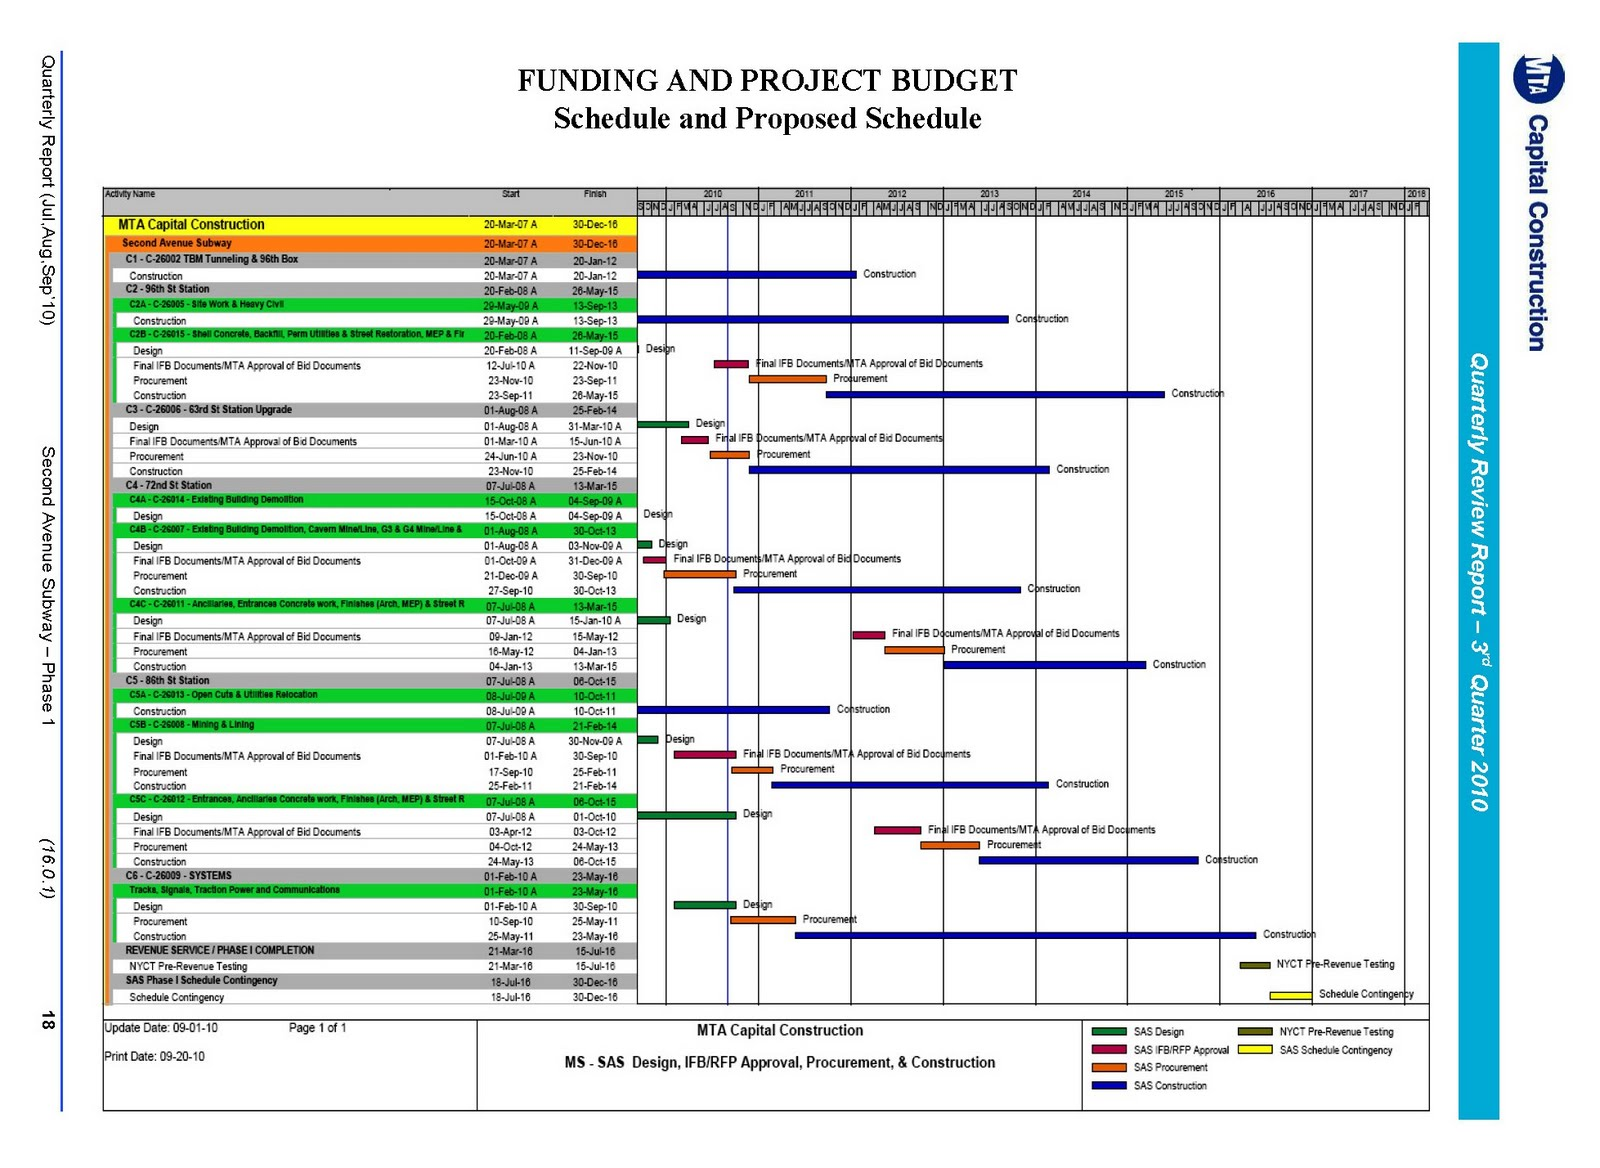 Daily Progress Report Format For Civil Construction - Calendar June